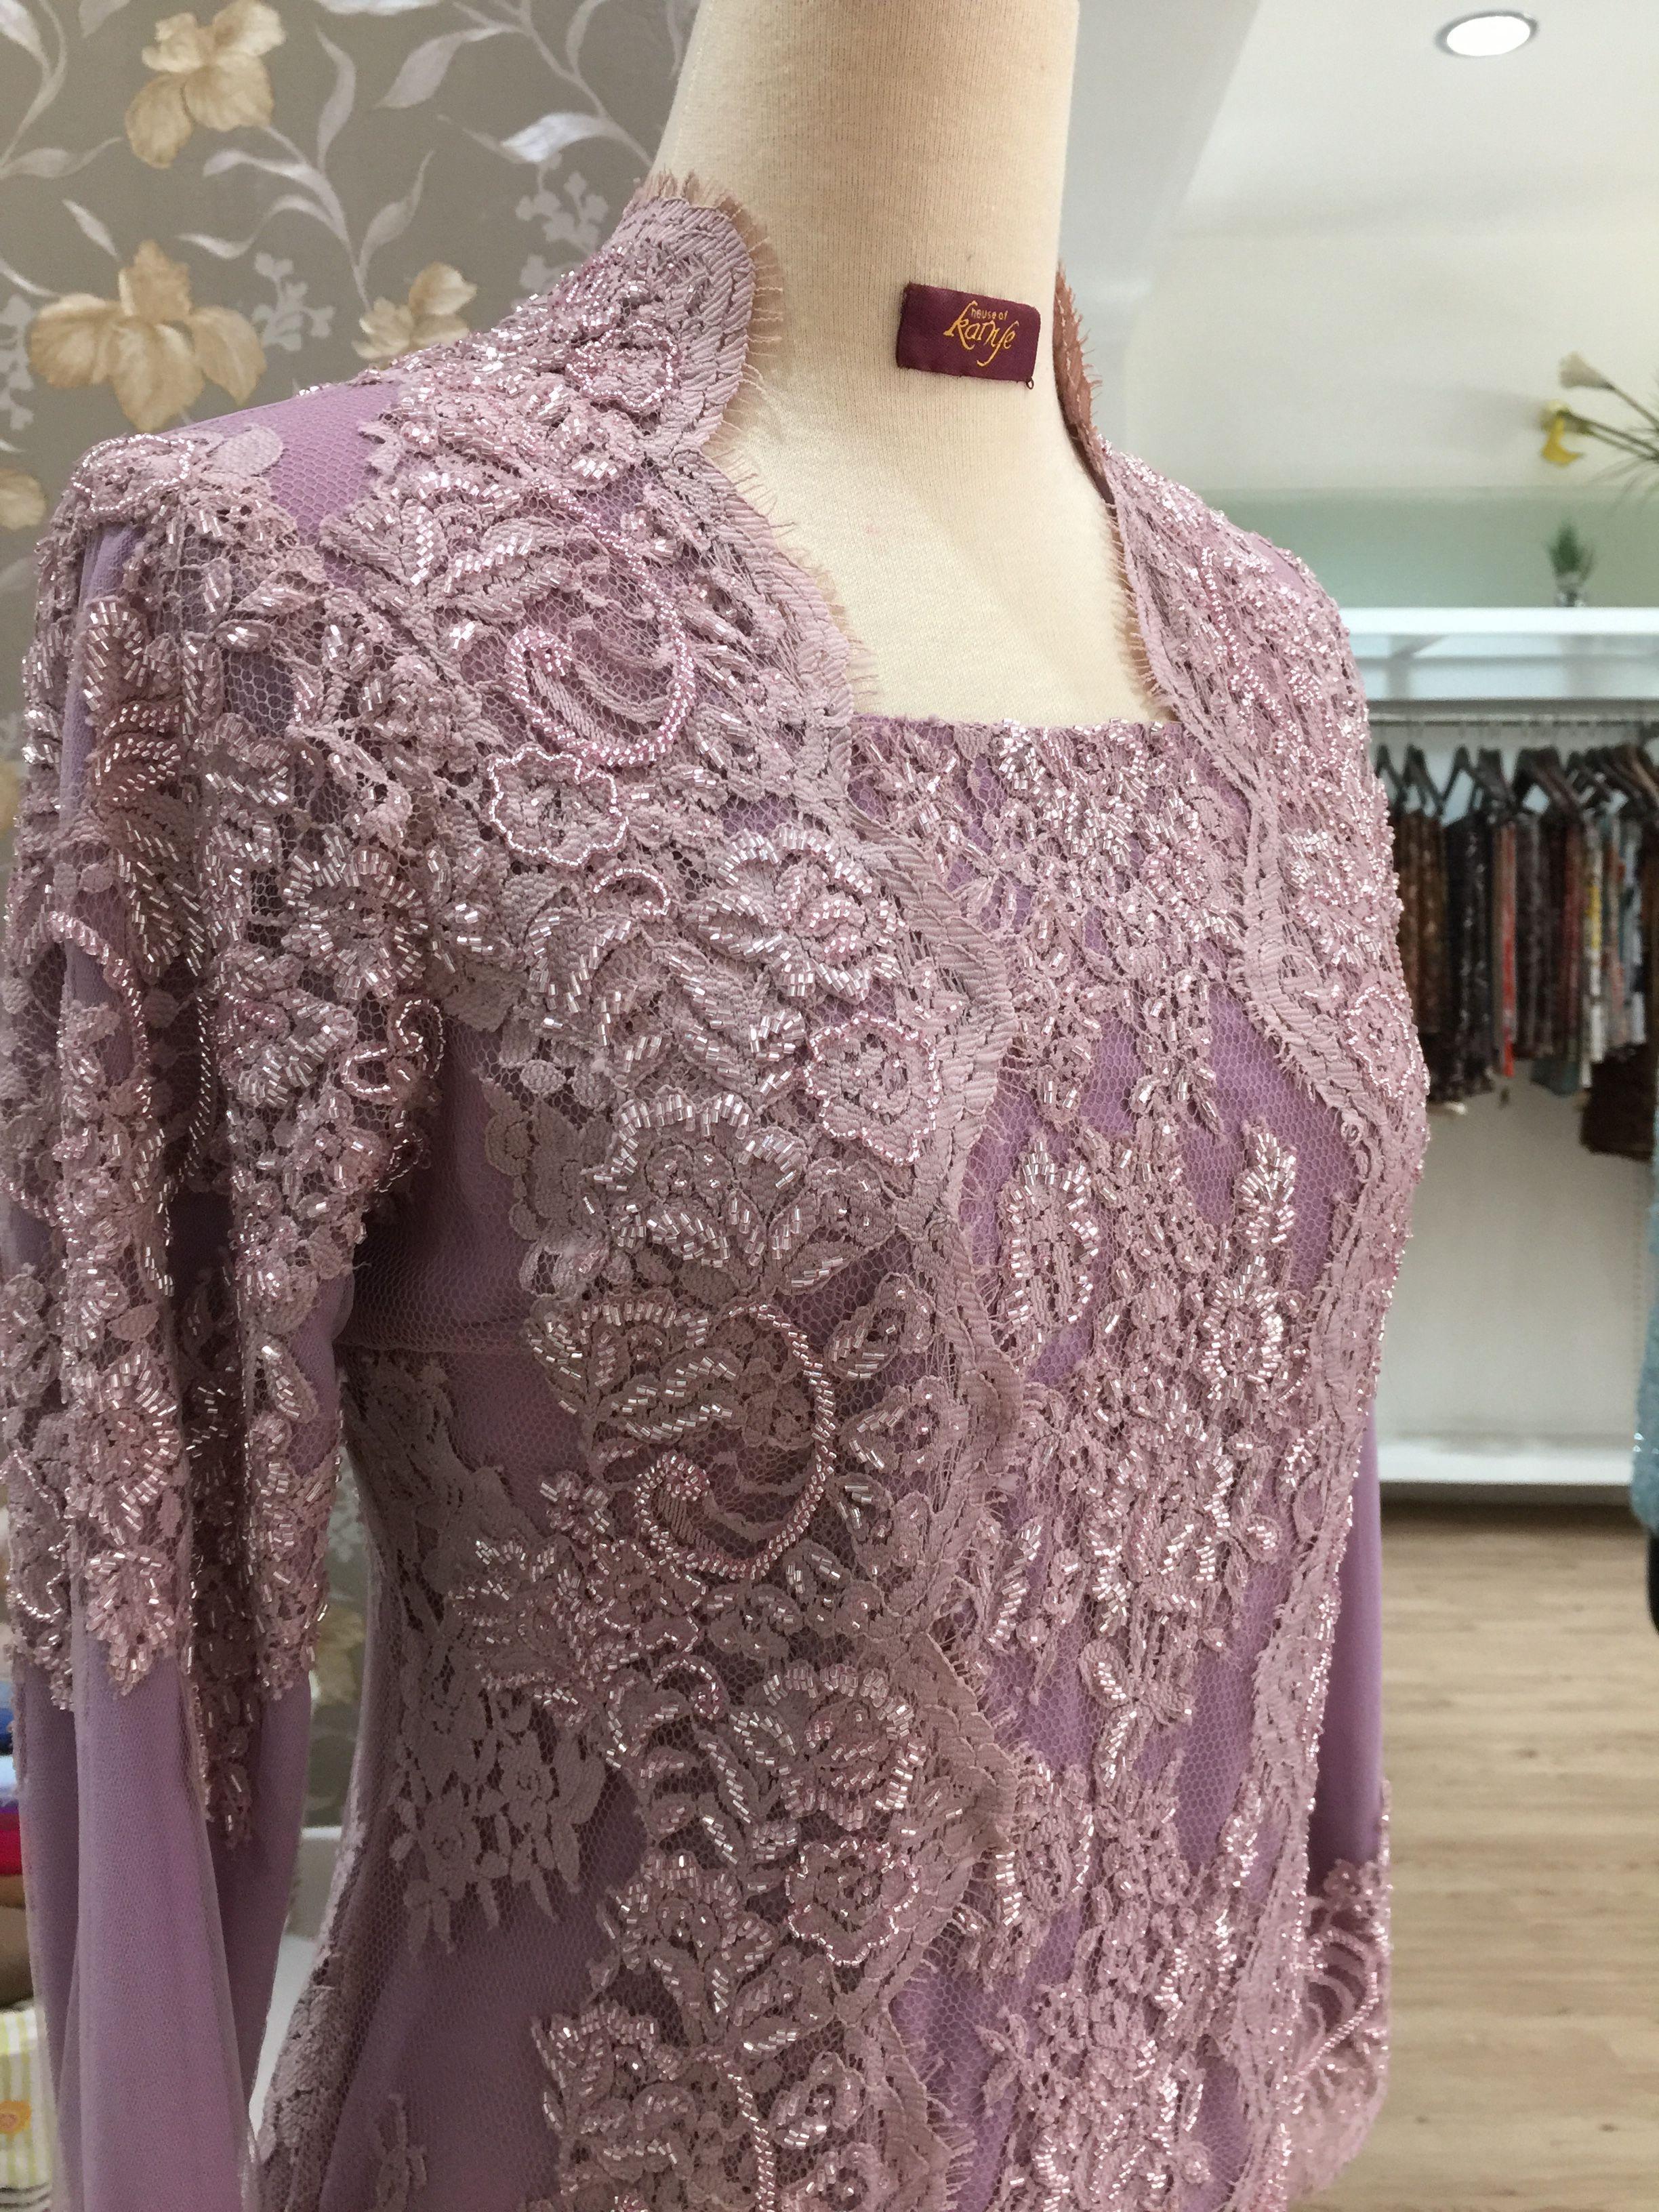 Kebaya Brokat Kebaya Lace Traditional Clothes Kebaya Muslim Batik Fashion Hijab Styles Baju Kurung Hijabs Prada